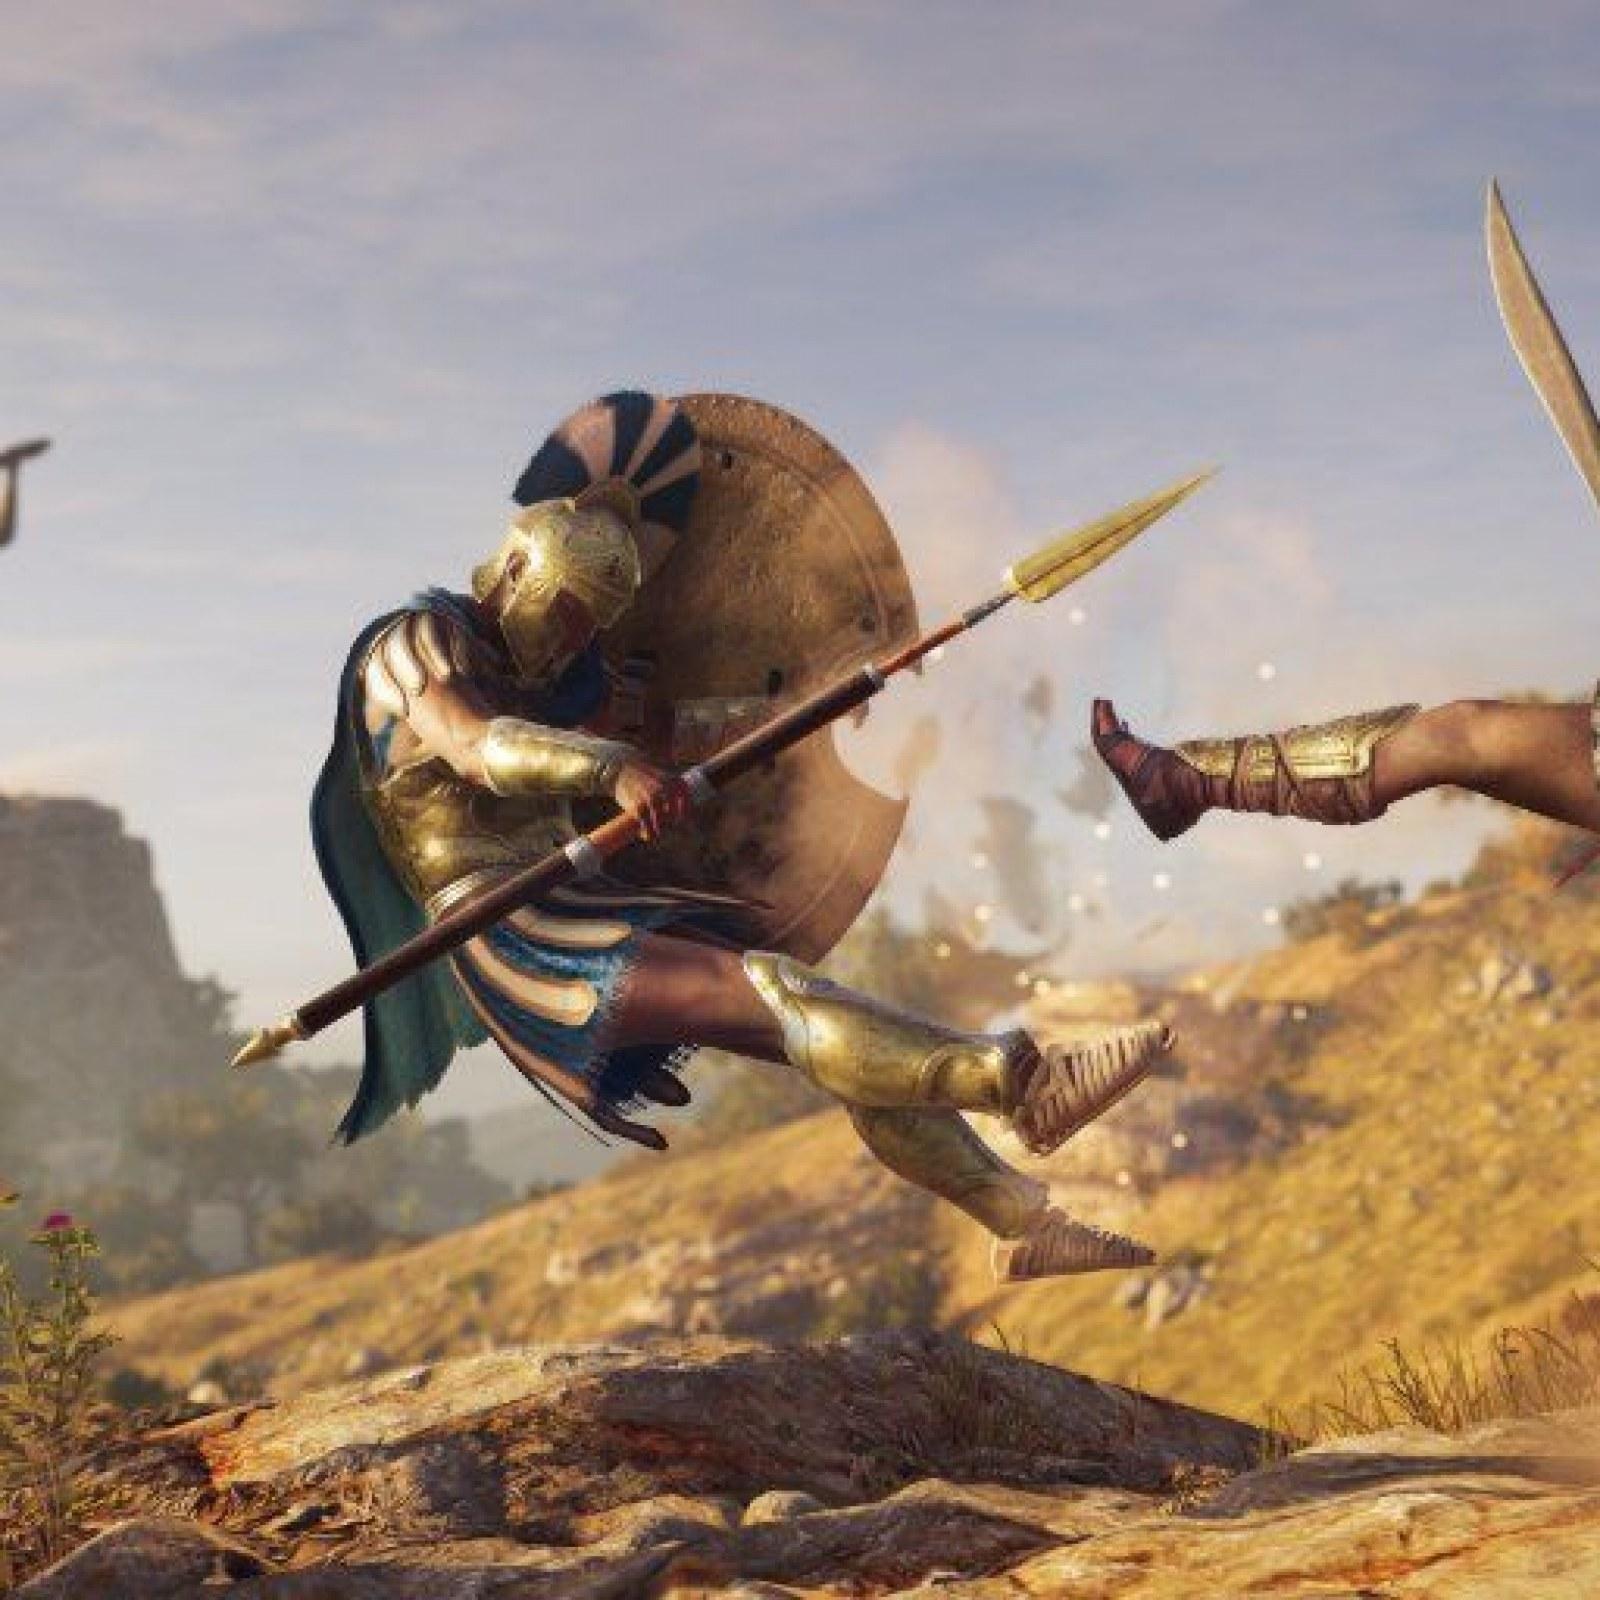 assassins creed origins ps4 download time